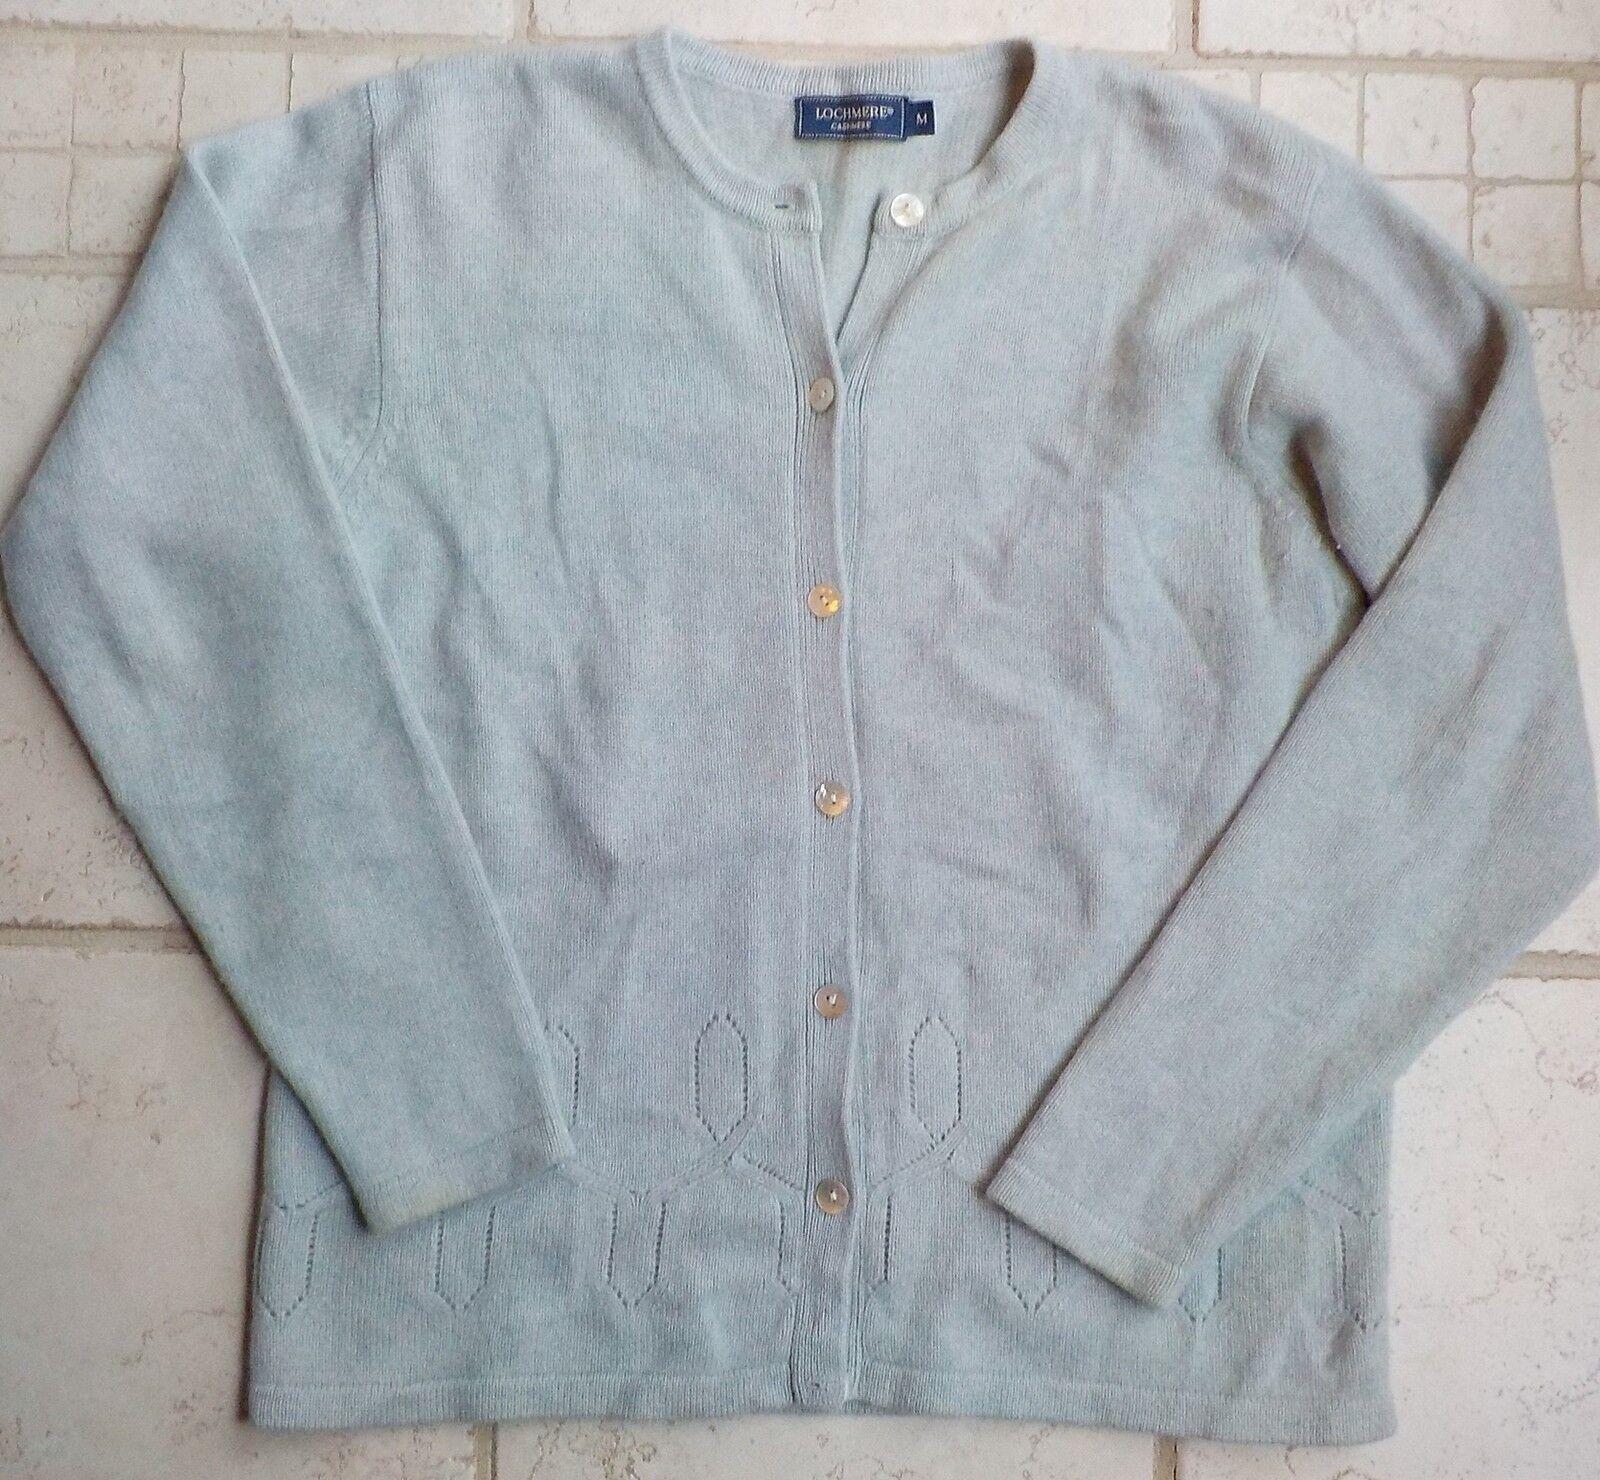 LOCHMERE Luxuriously Soft Light bluee 100% Cashmere Cardigan Medium